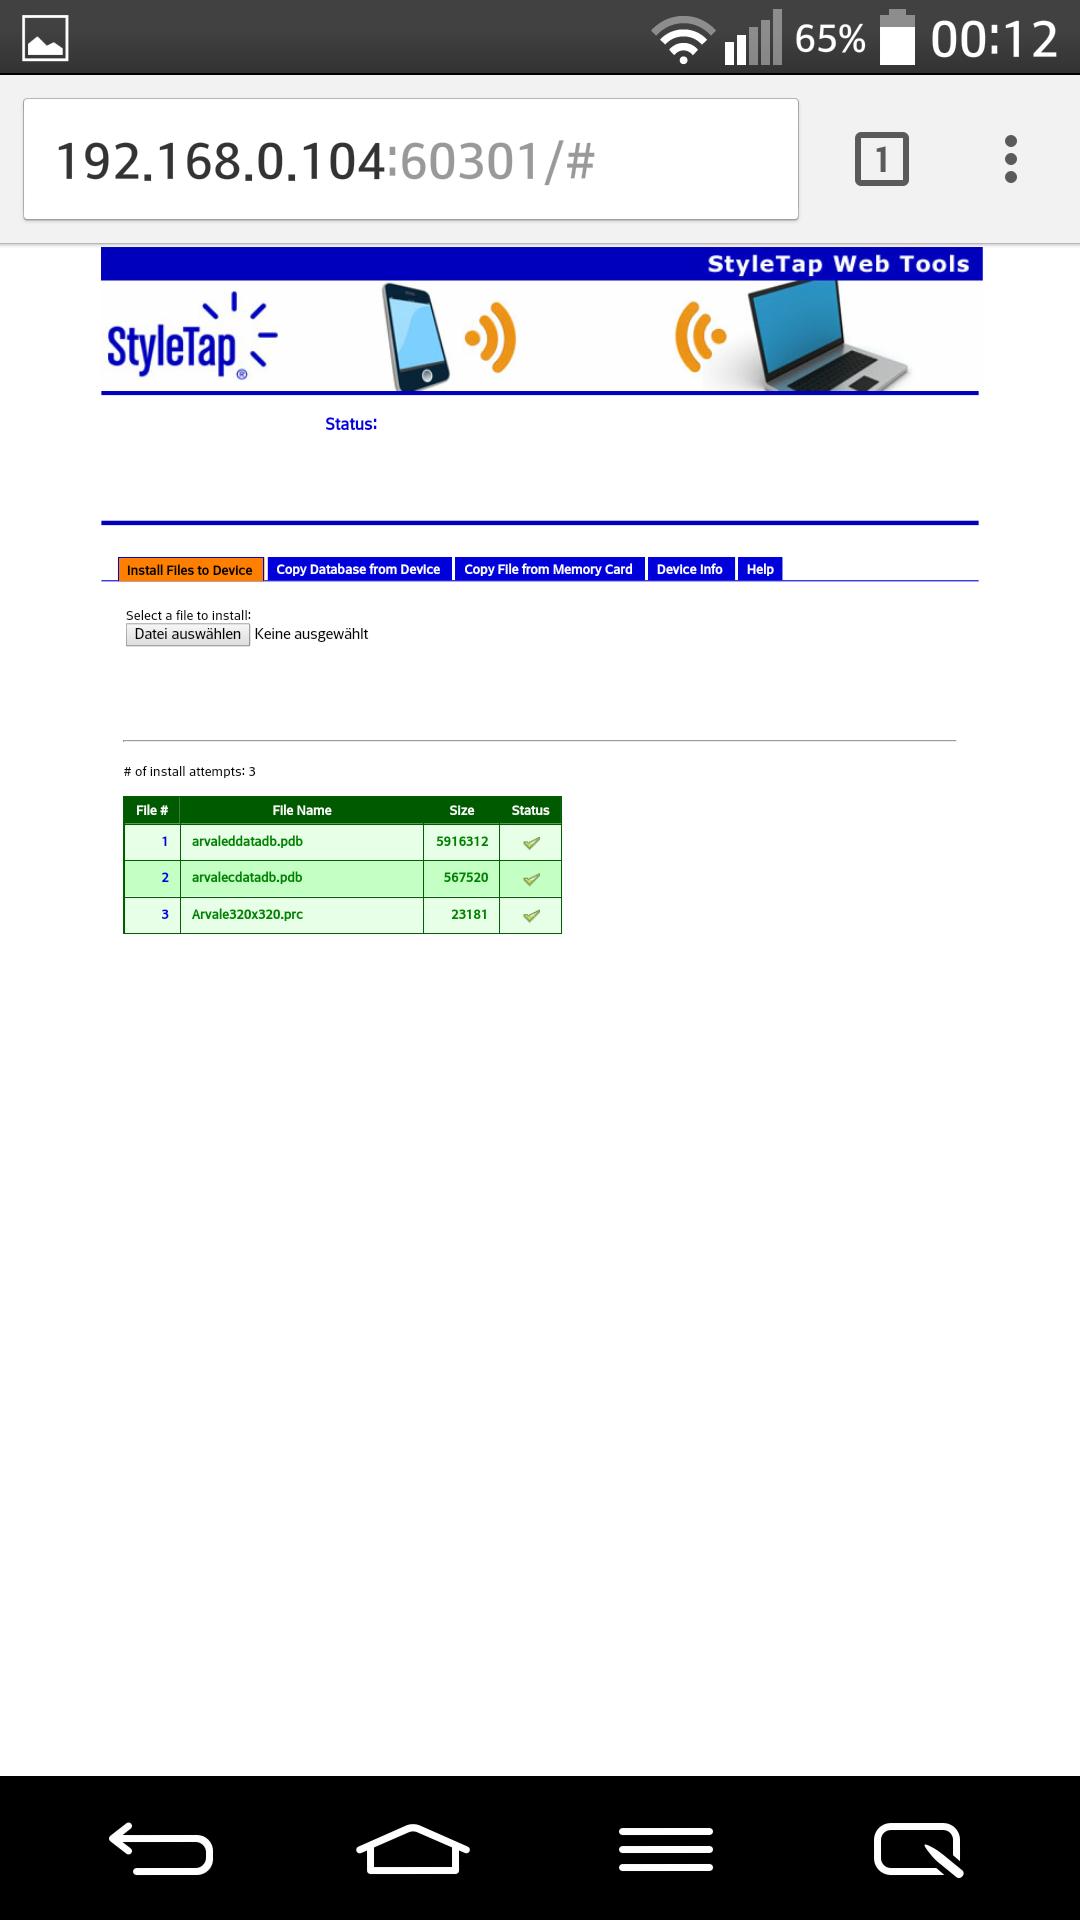 Screenshot_2015-04-08-00-12-05.png